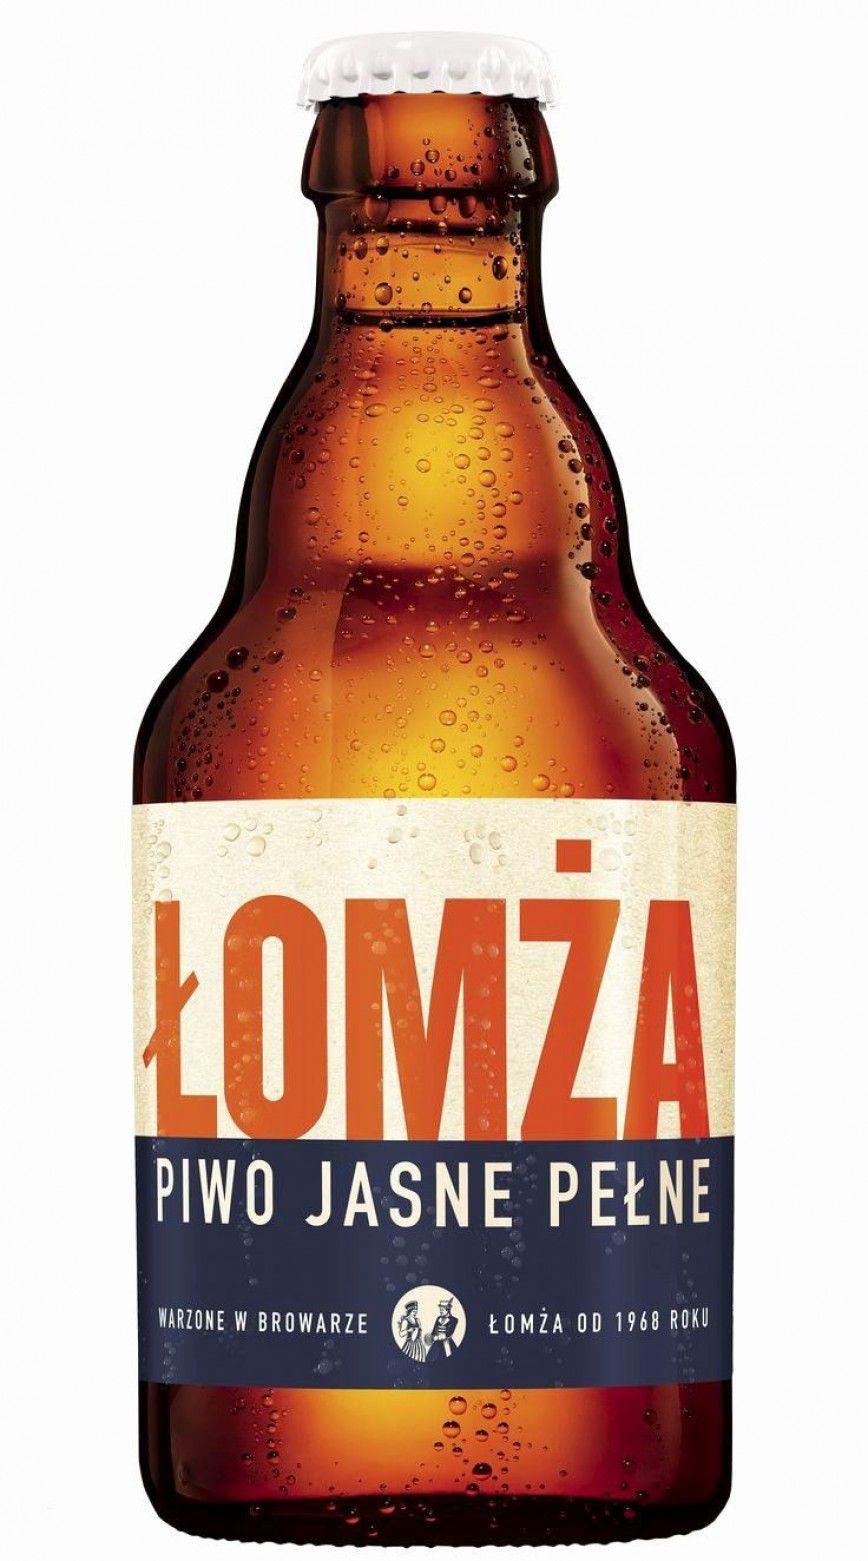 002 Shocking Beer Bottle Label Template Word Inspiration  FreeFull